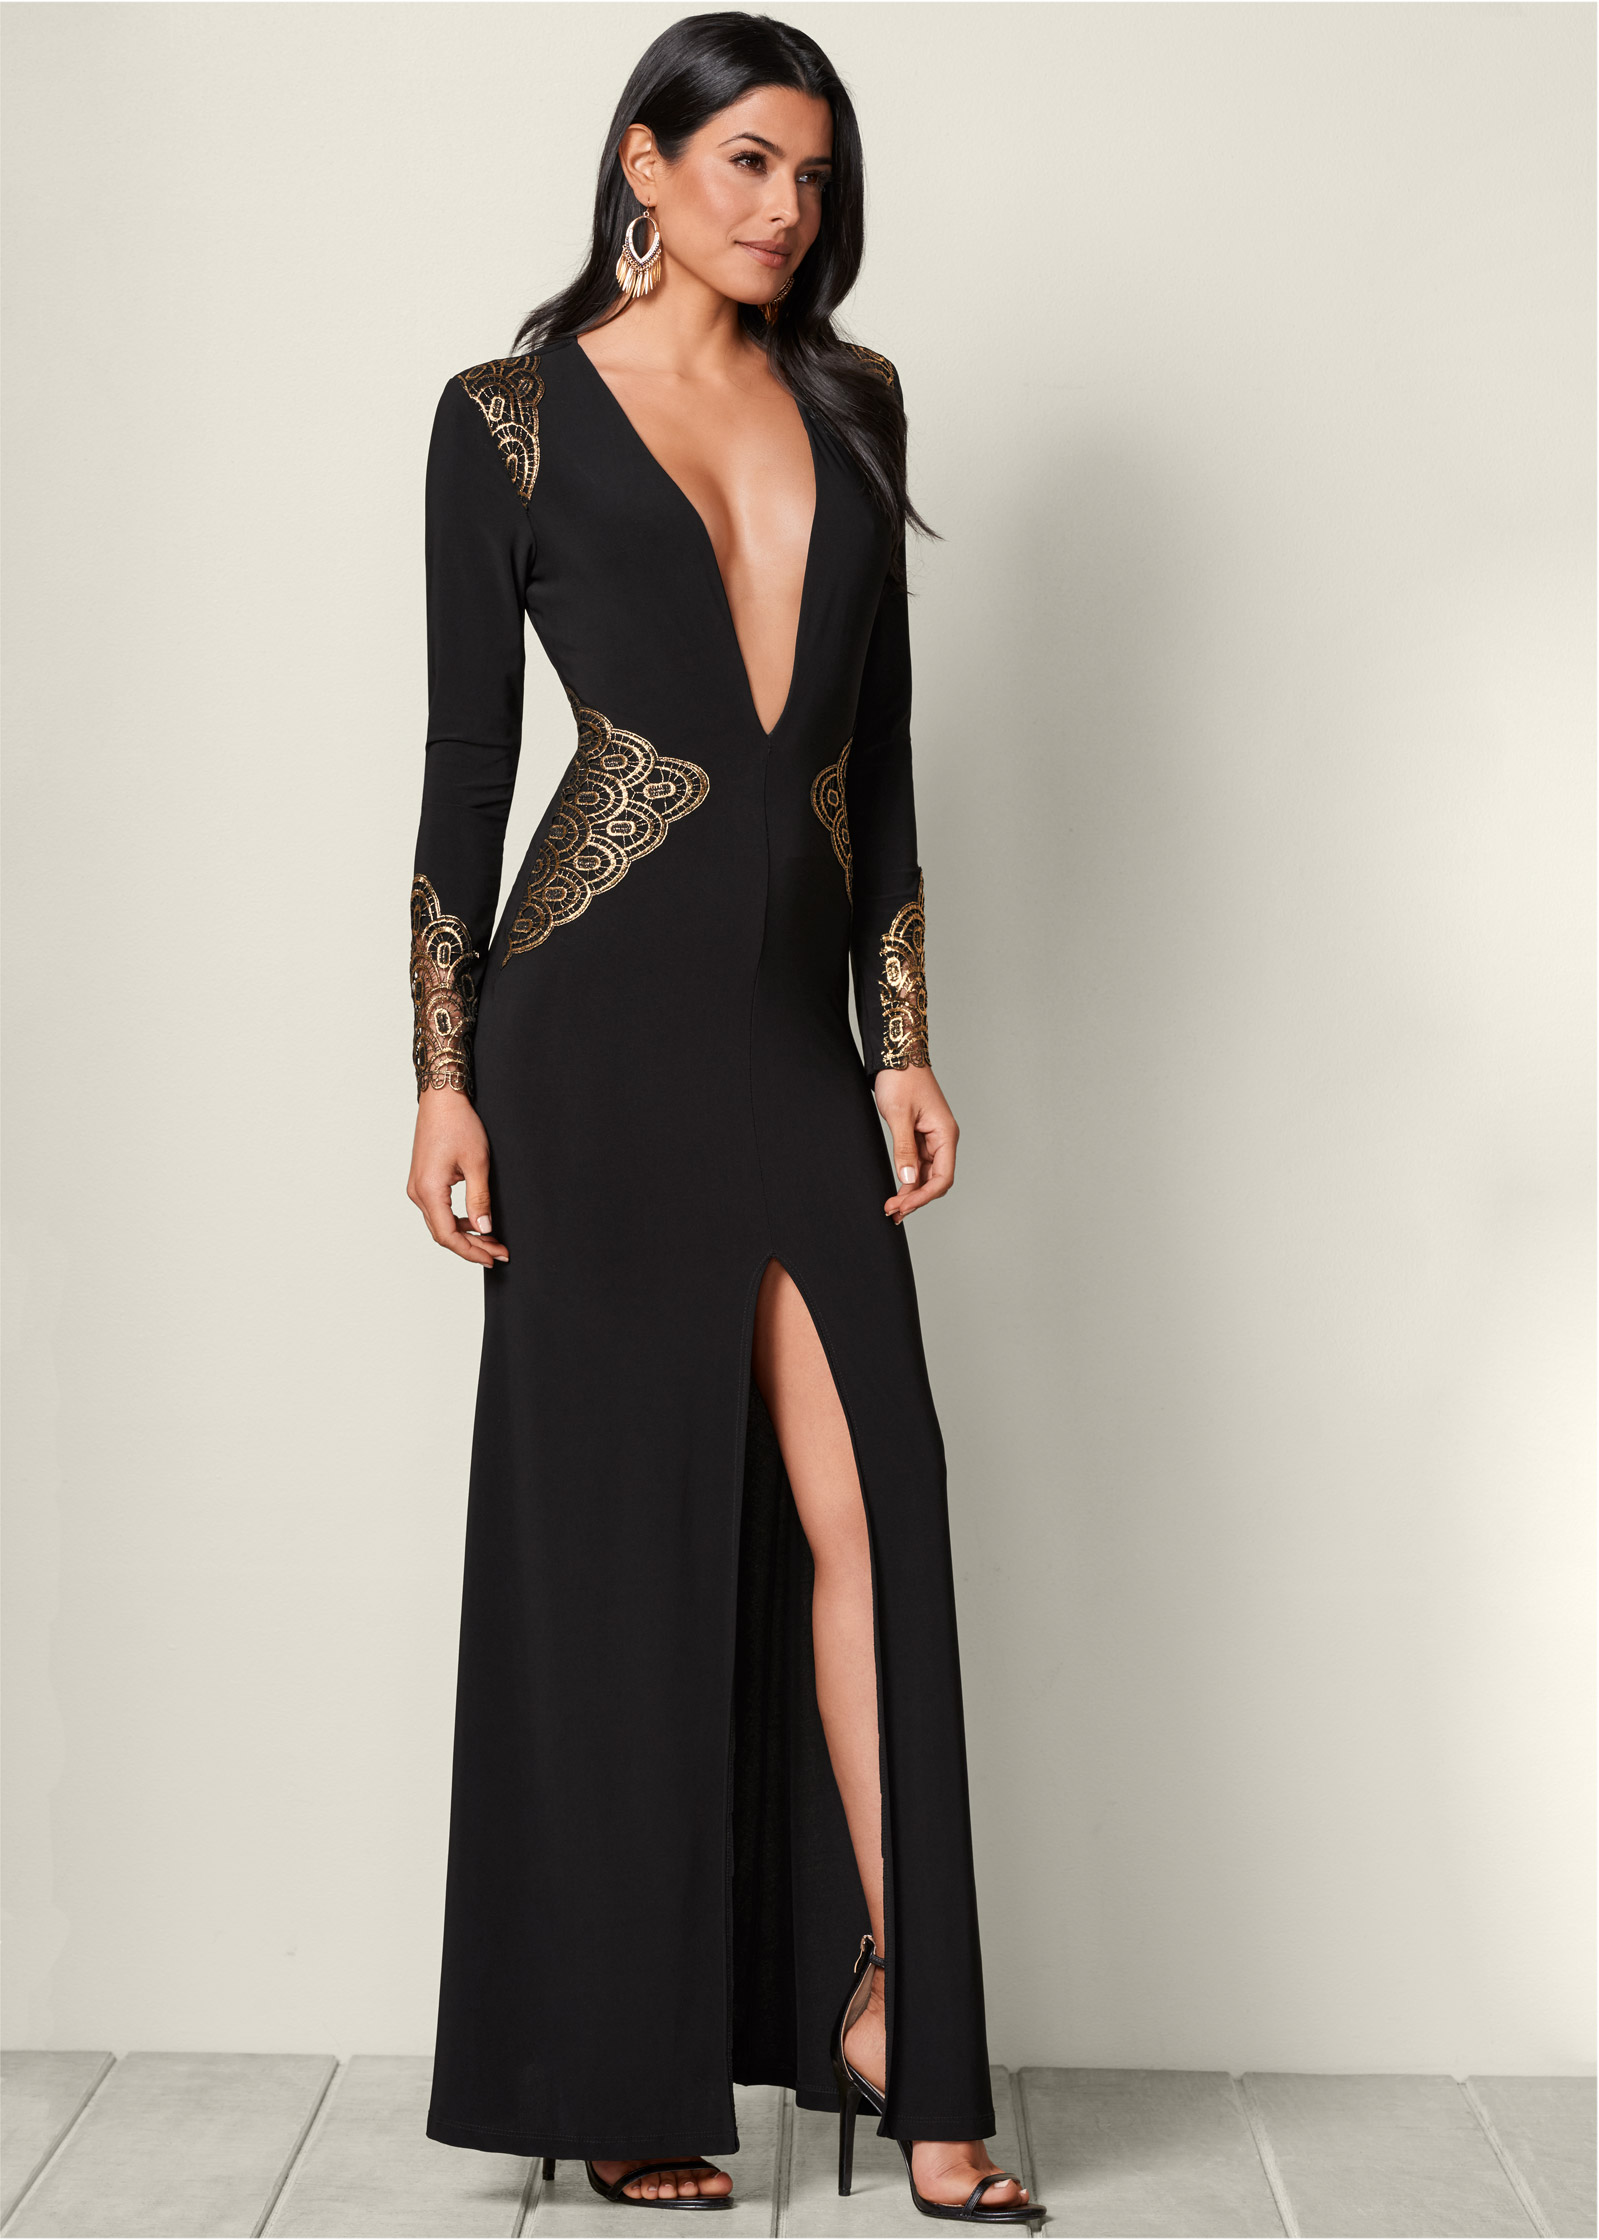 Black Formal Long Dresses